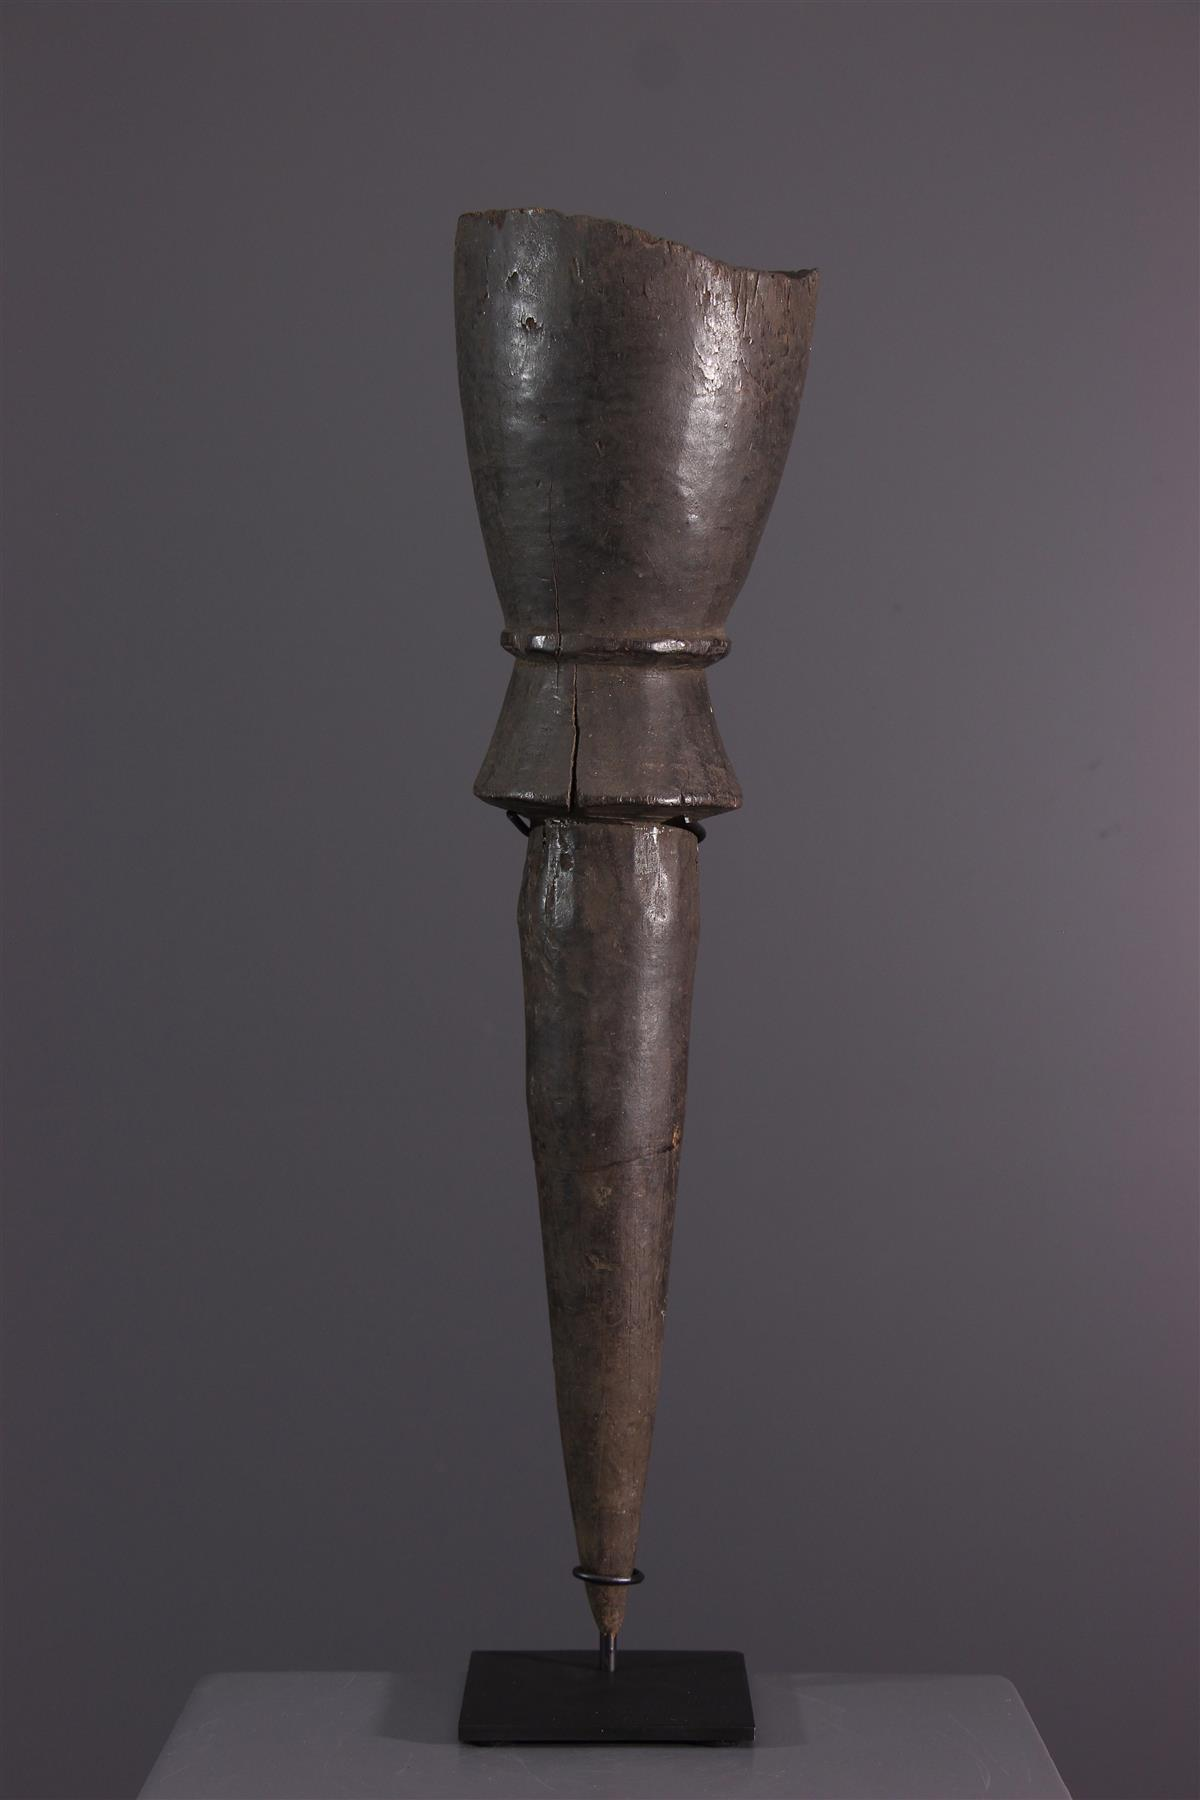 Pende Cup - African art